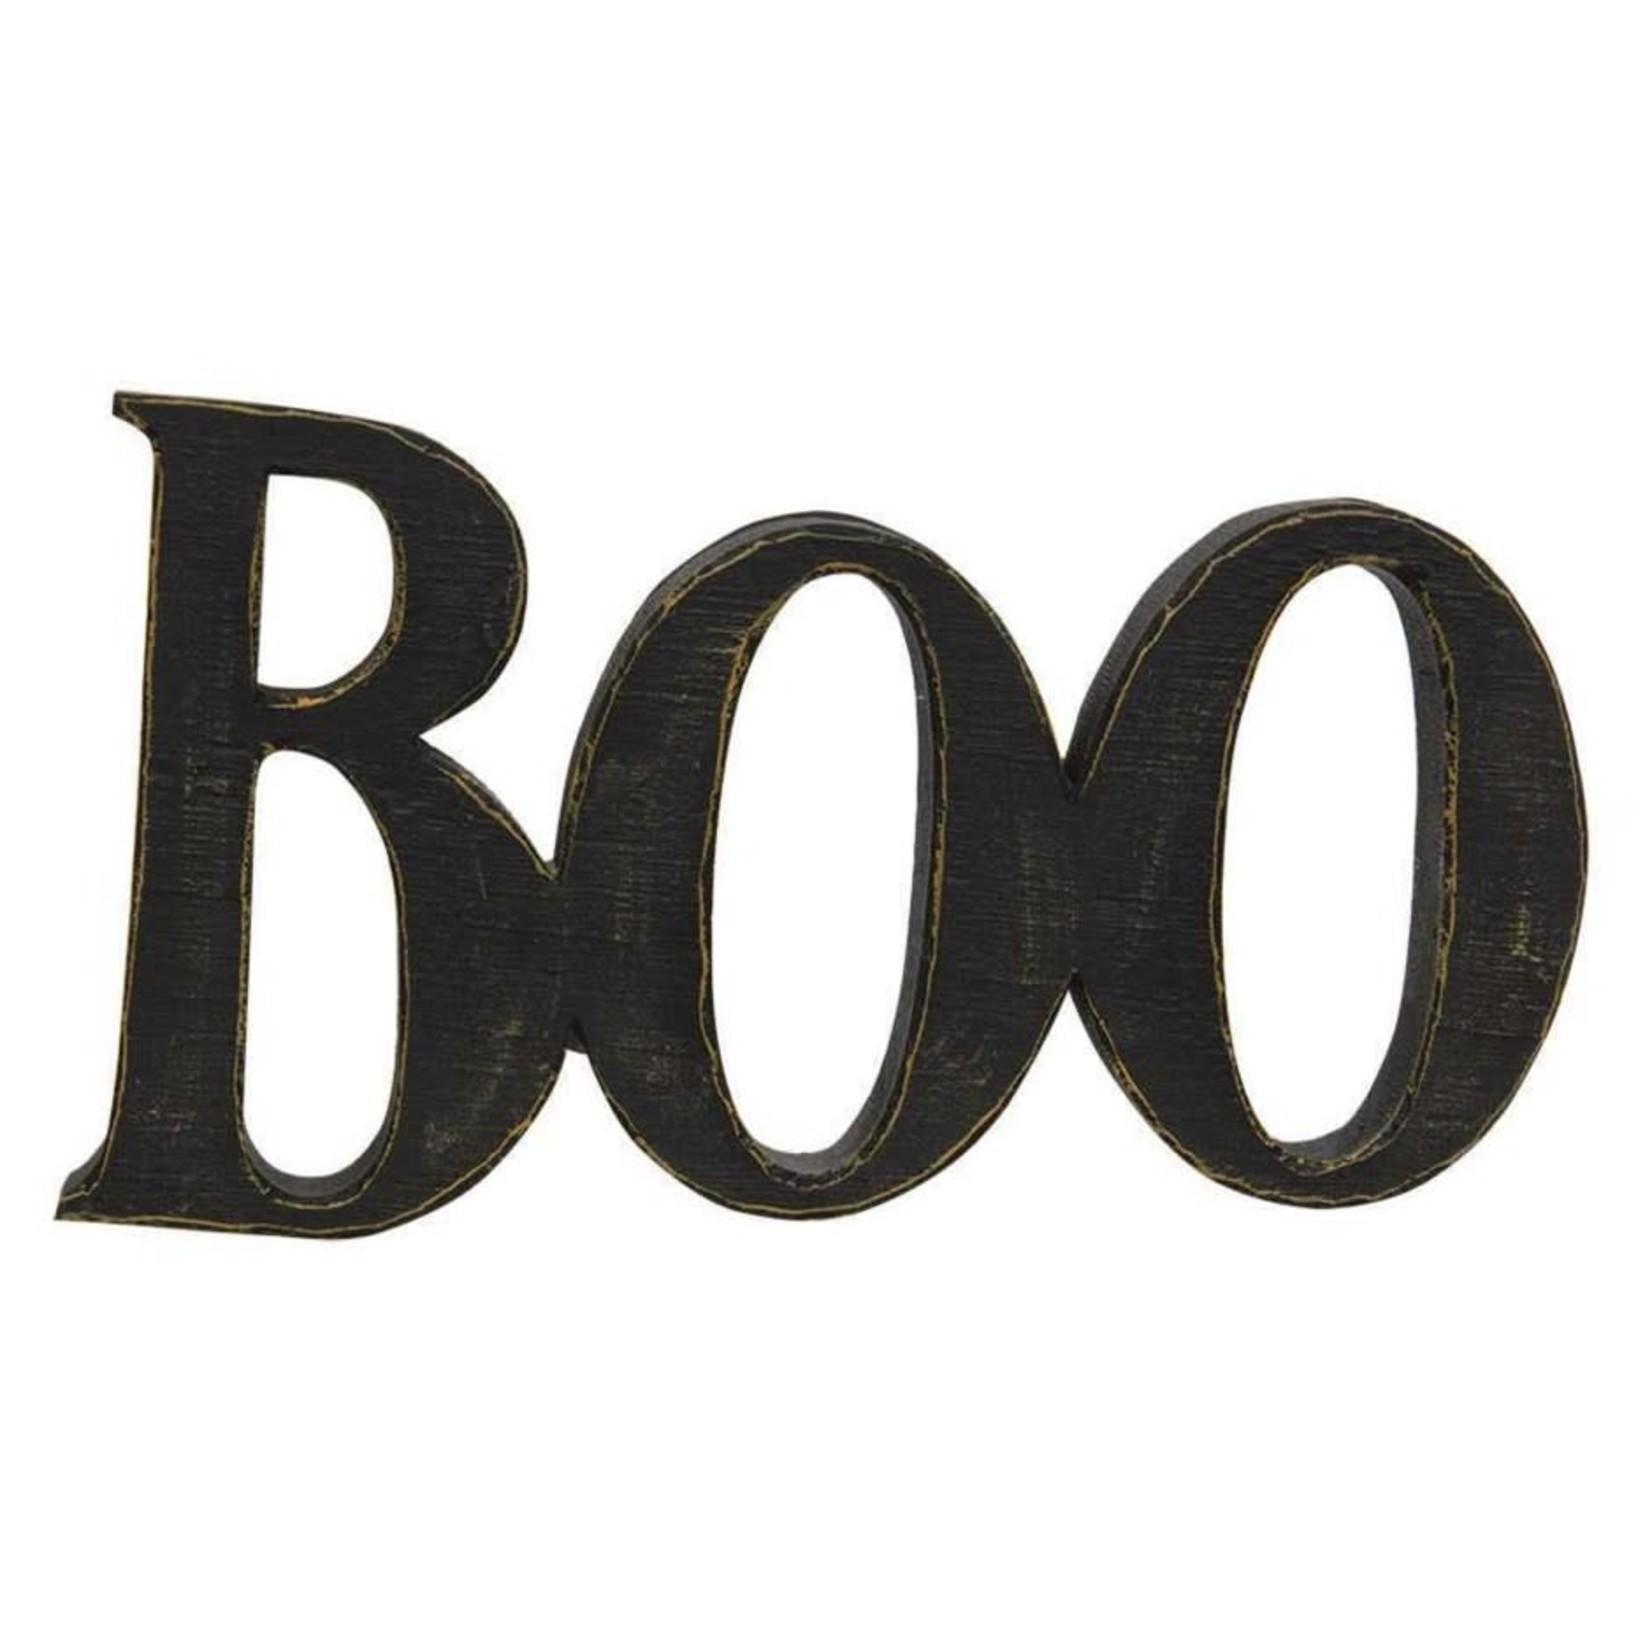 Boo Resin Sitter